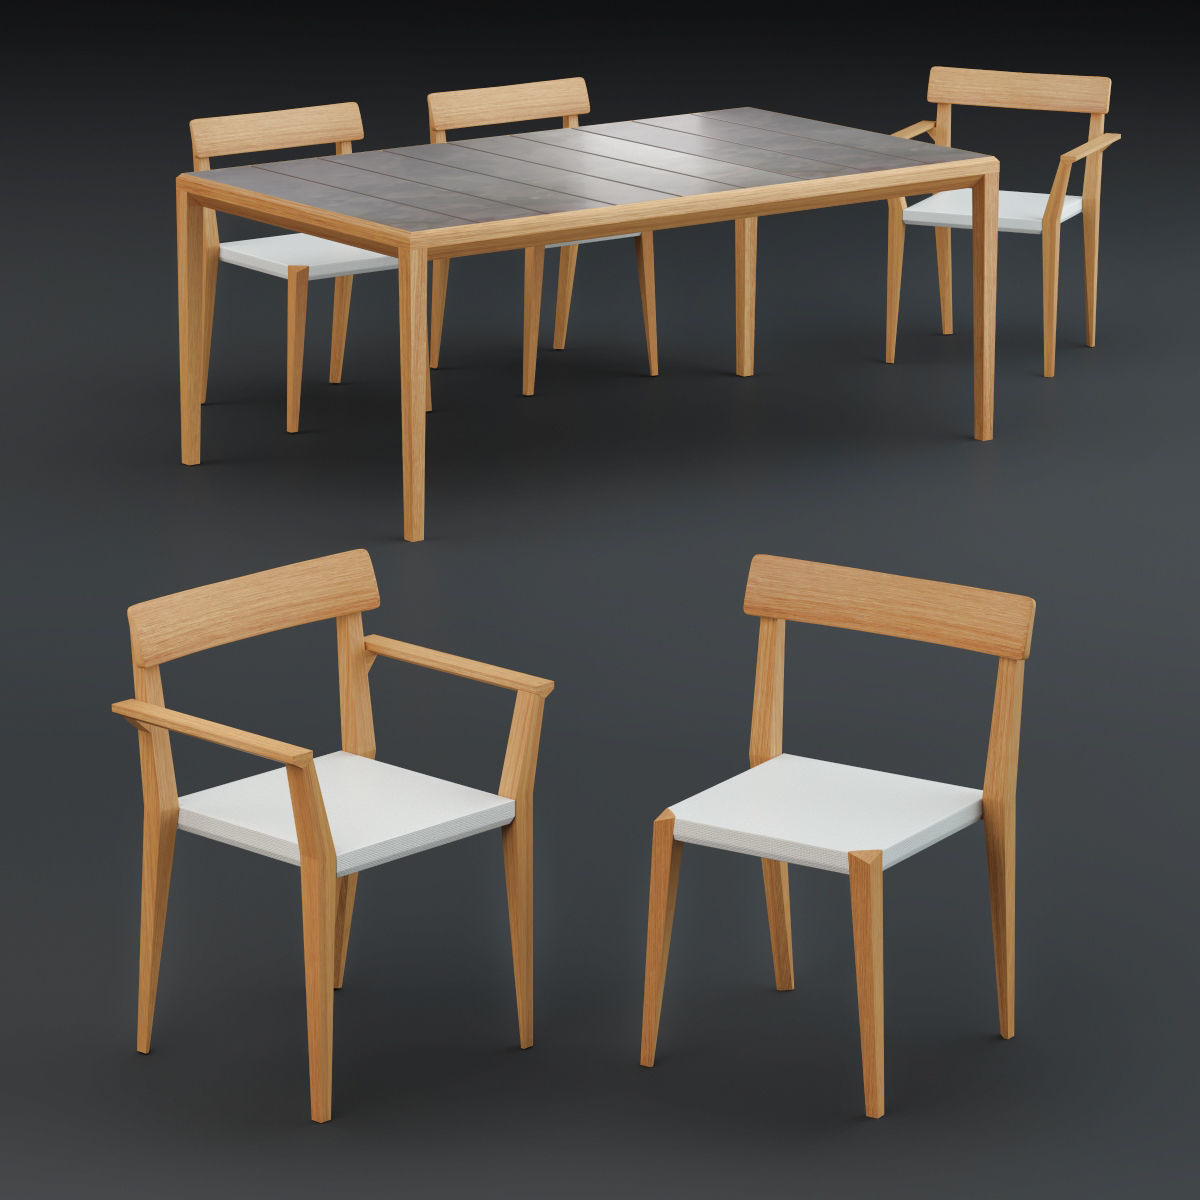 Roda Teka Dining Table and Chair